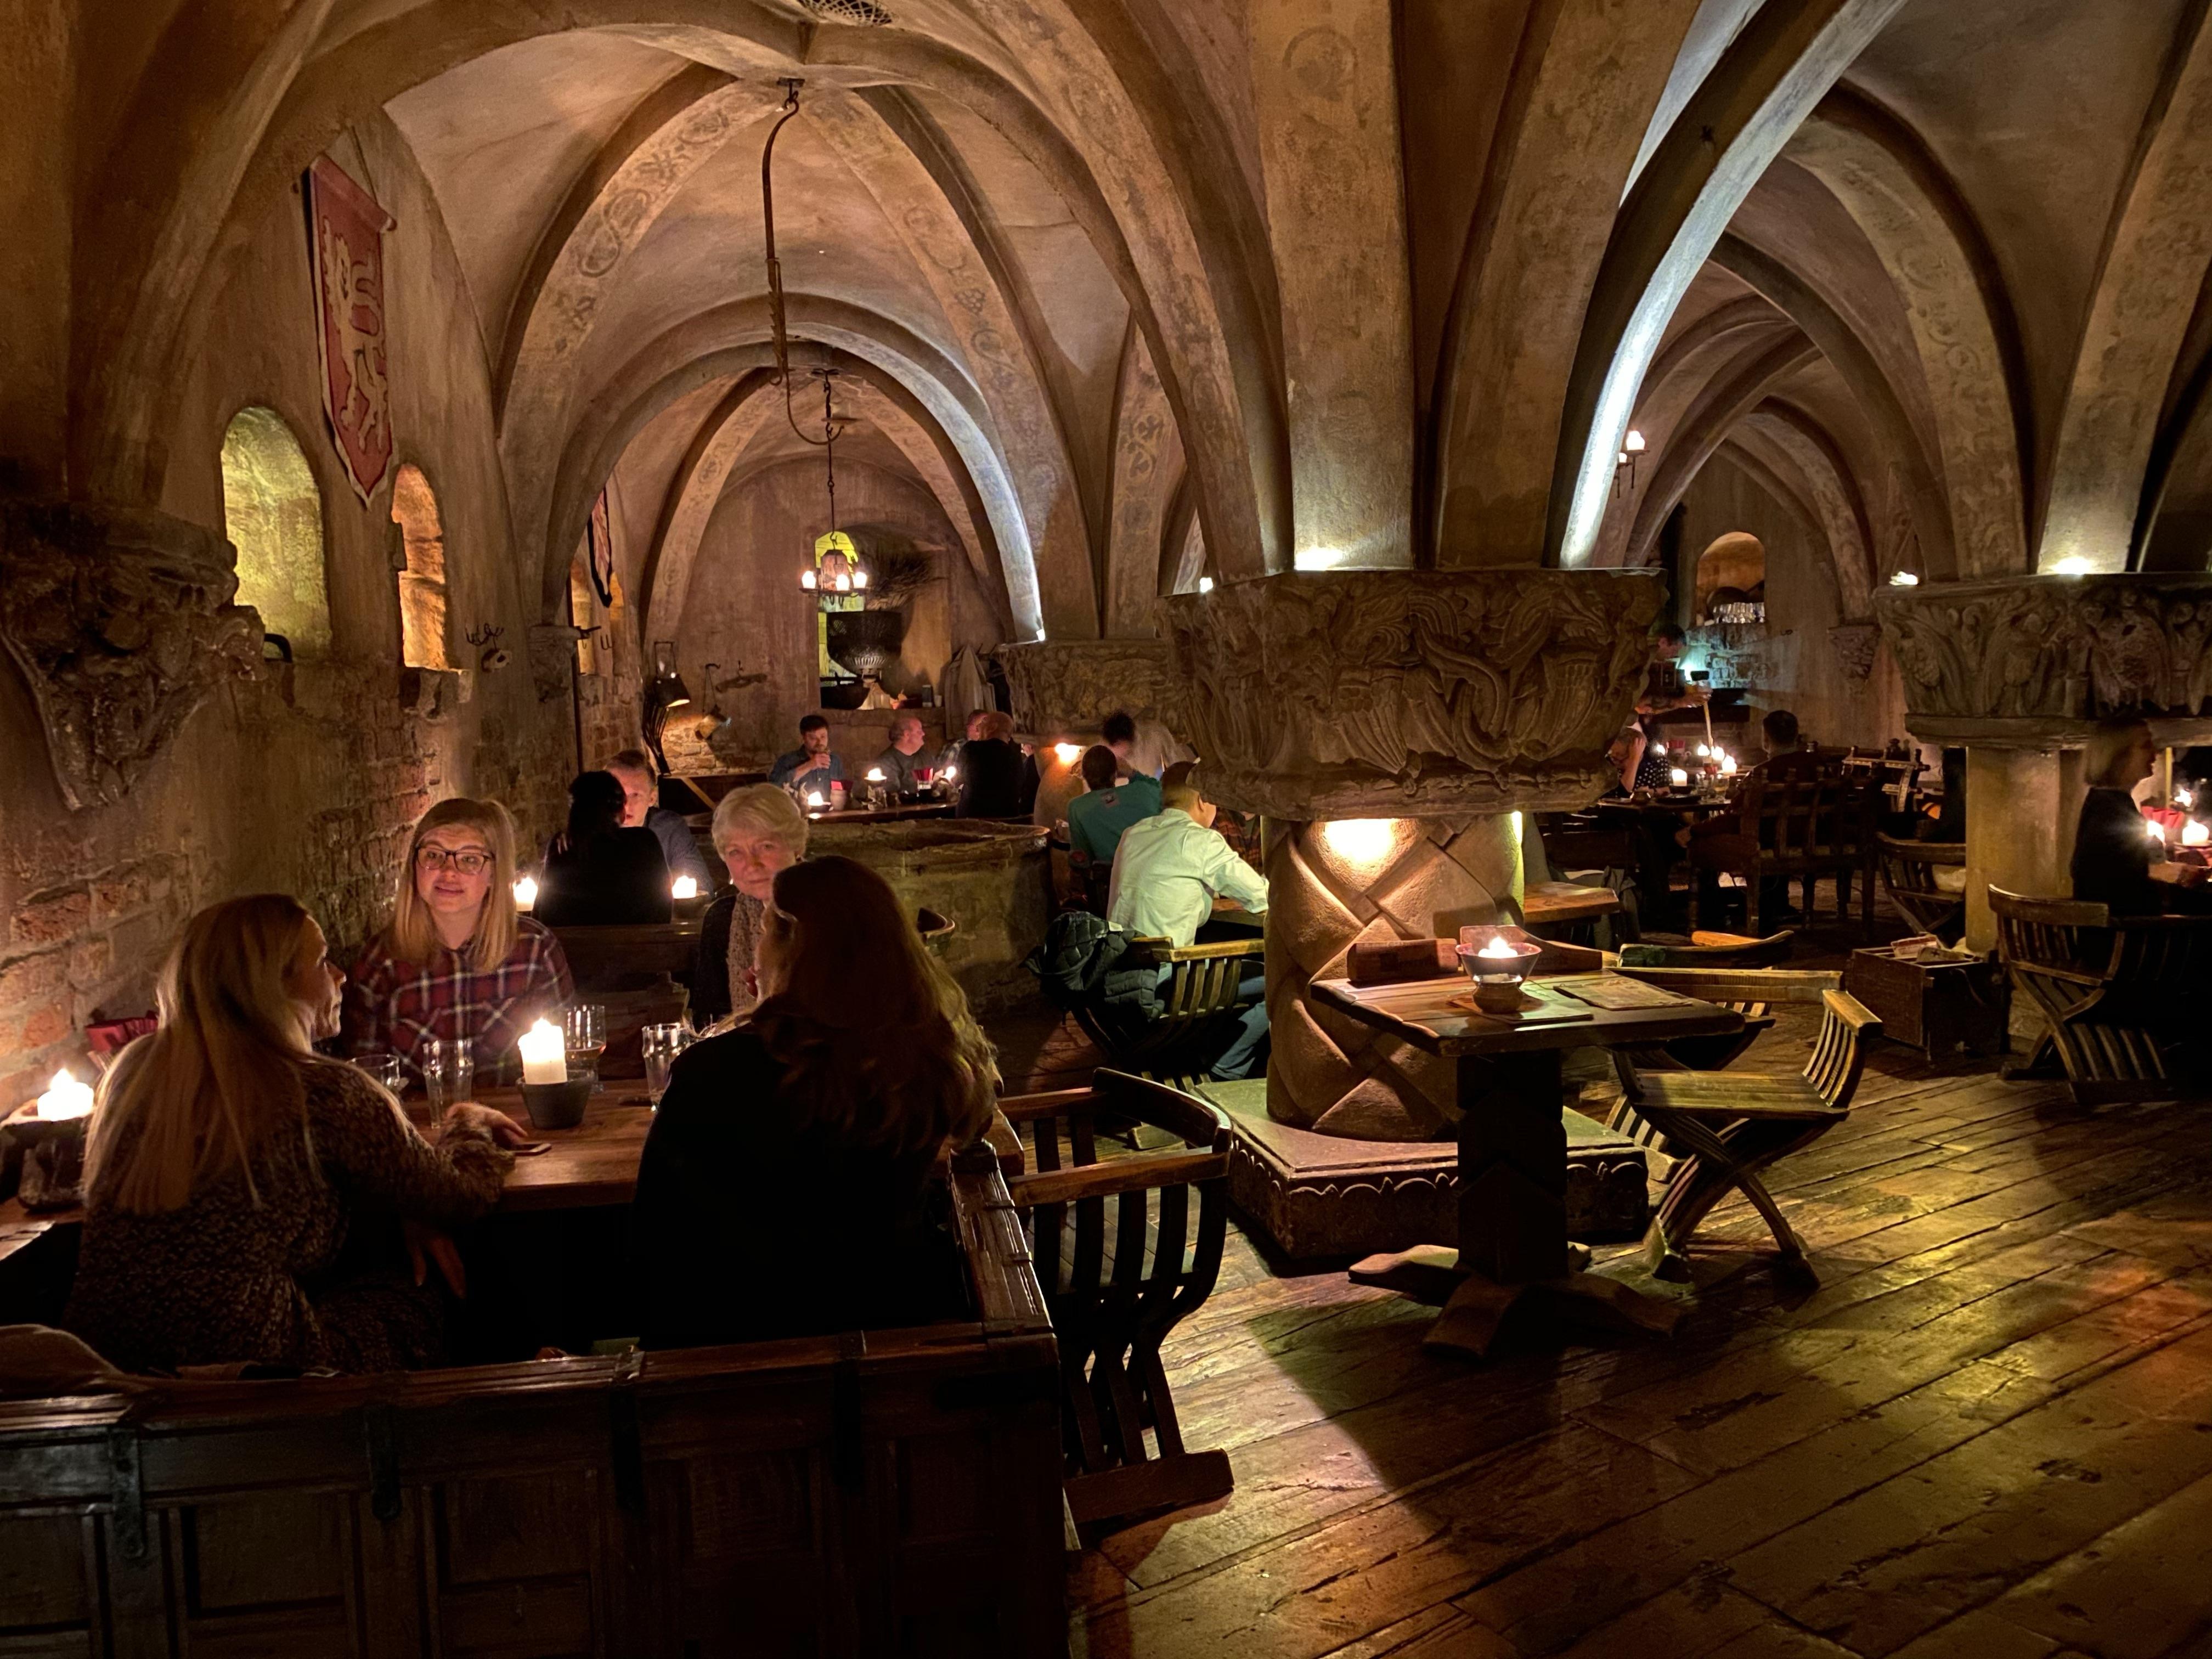 Inside of Rozengrāls medieval restaurant in Riga, Latvia.